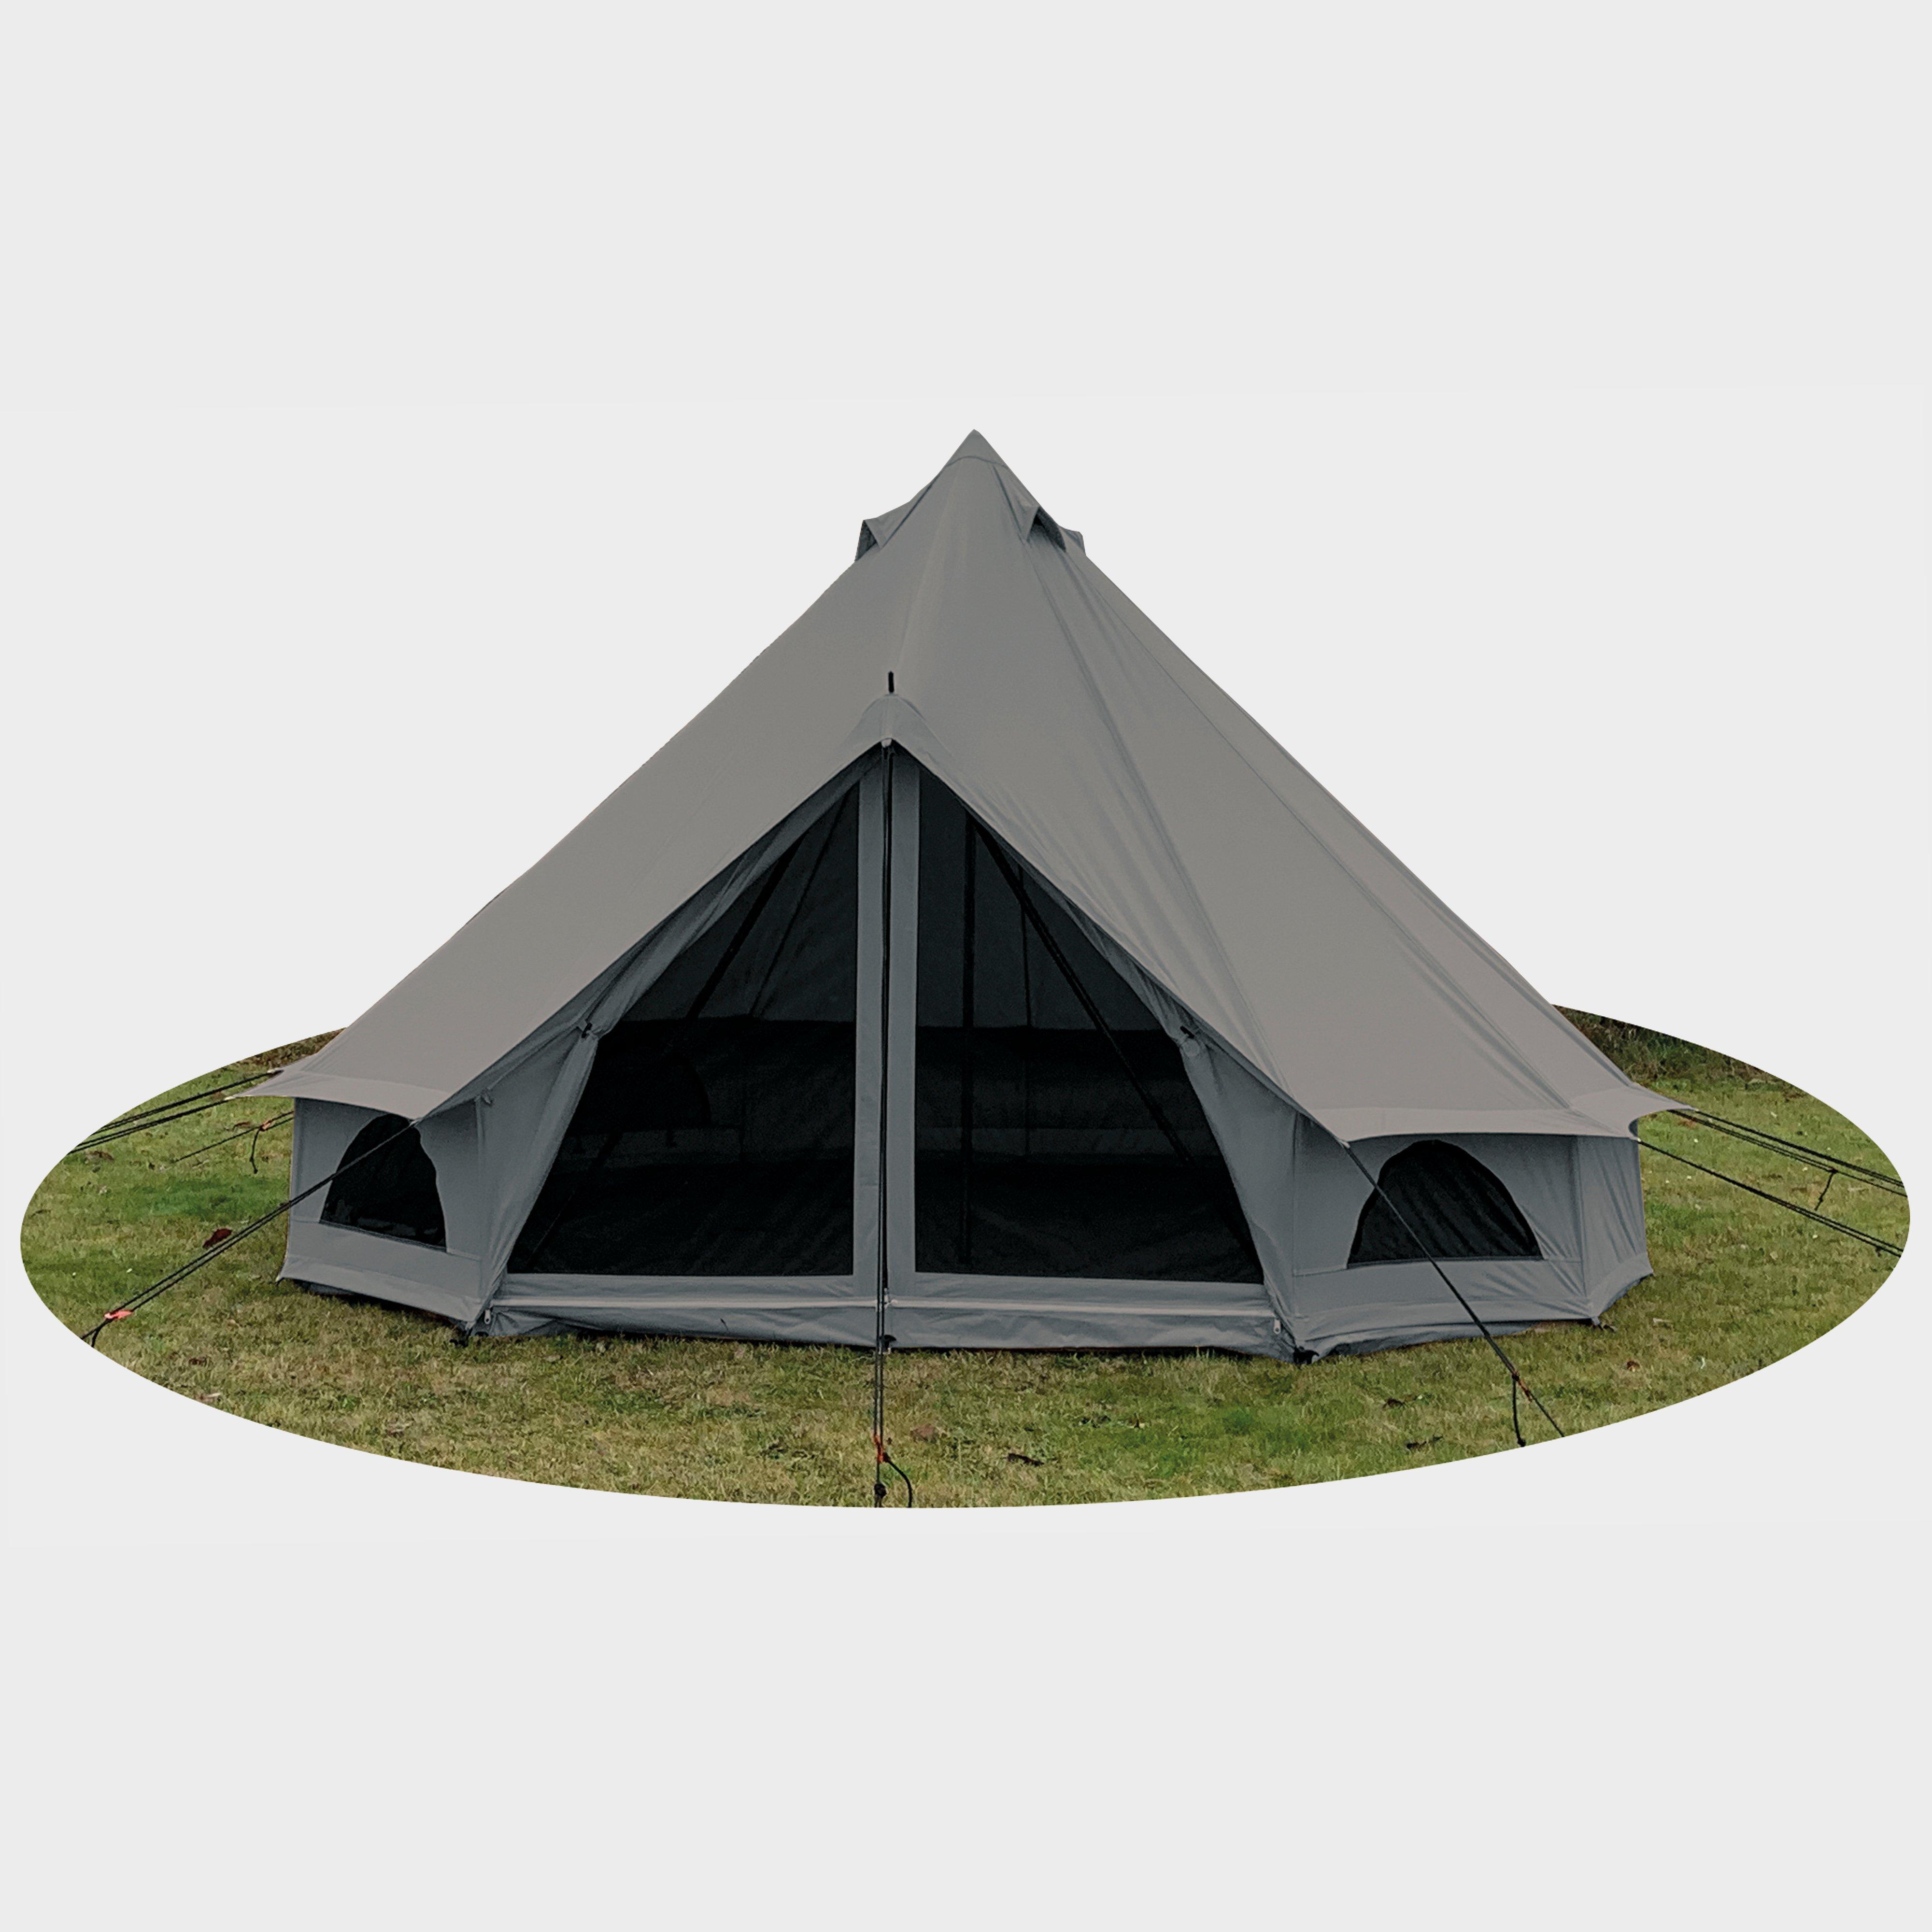 Quest Quest 5-Metre Bell Tent, Grey